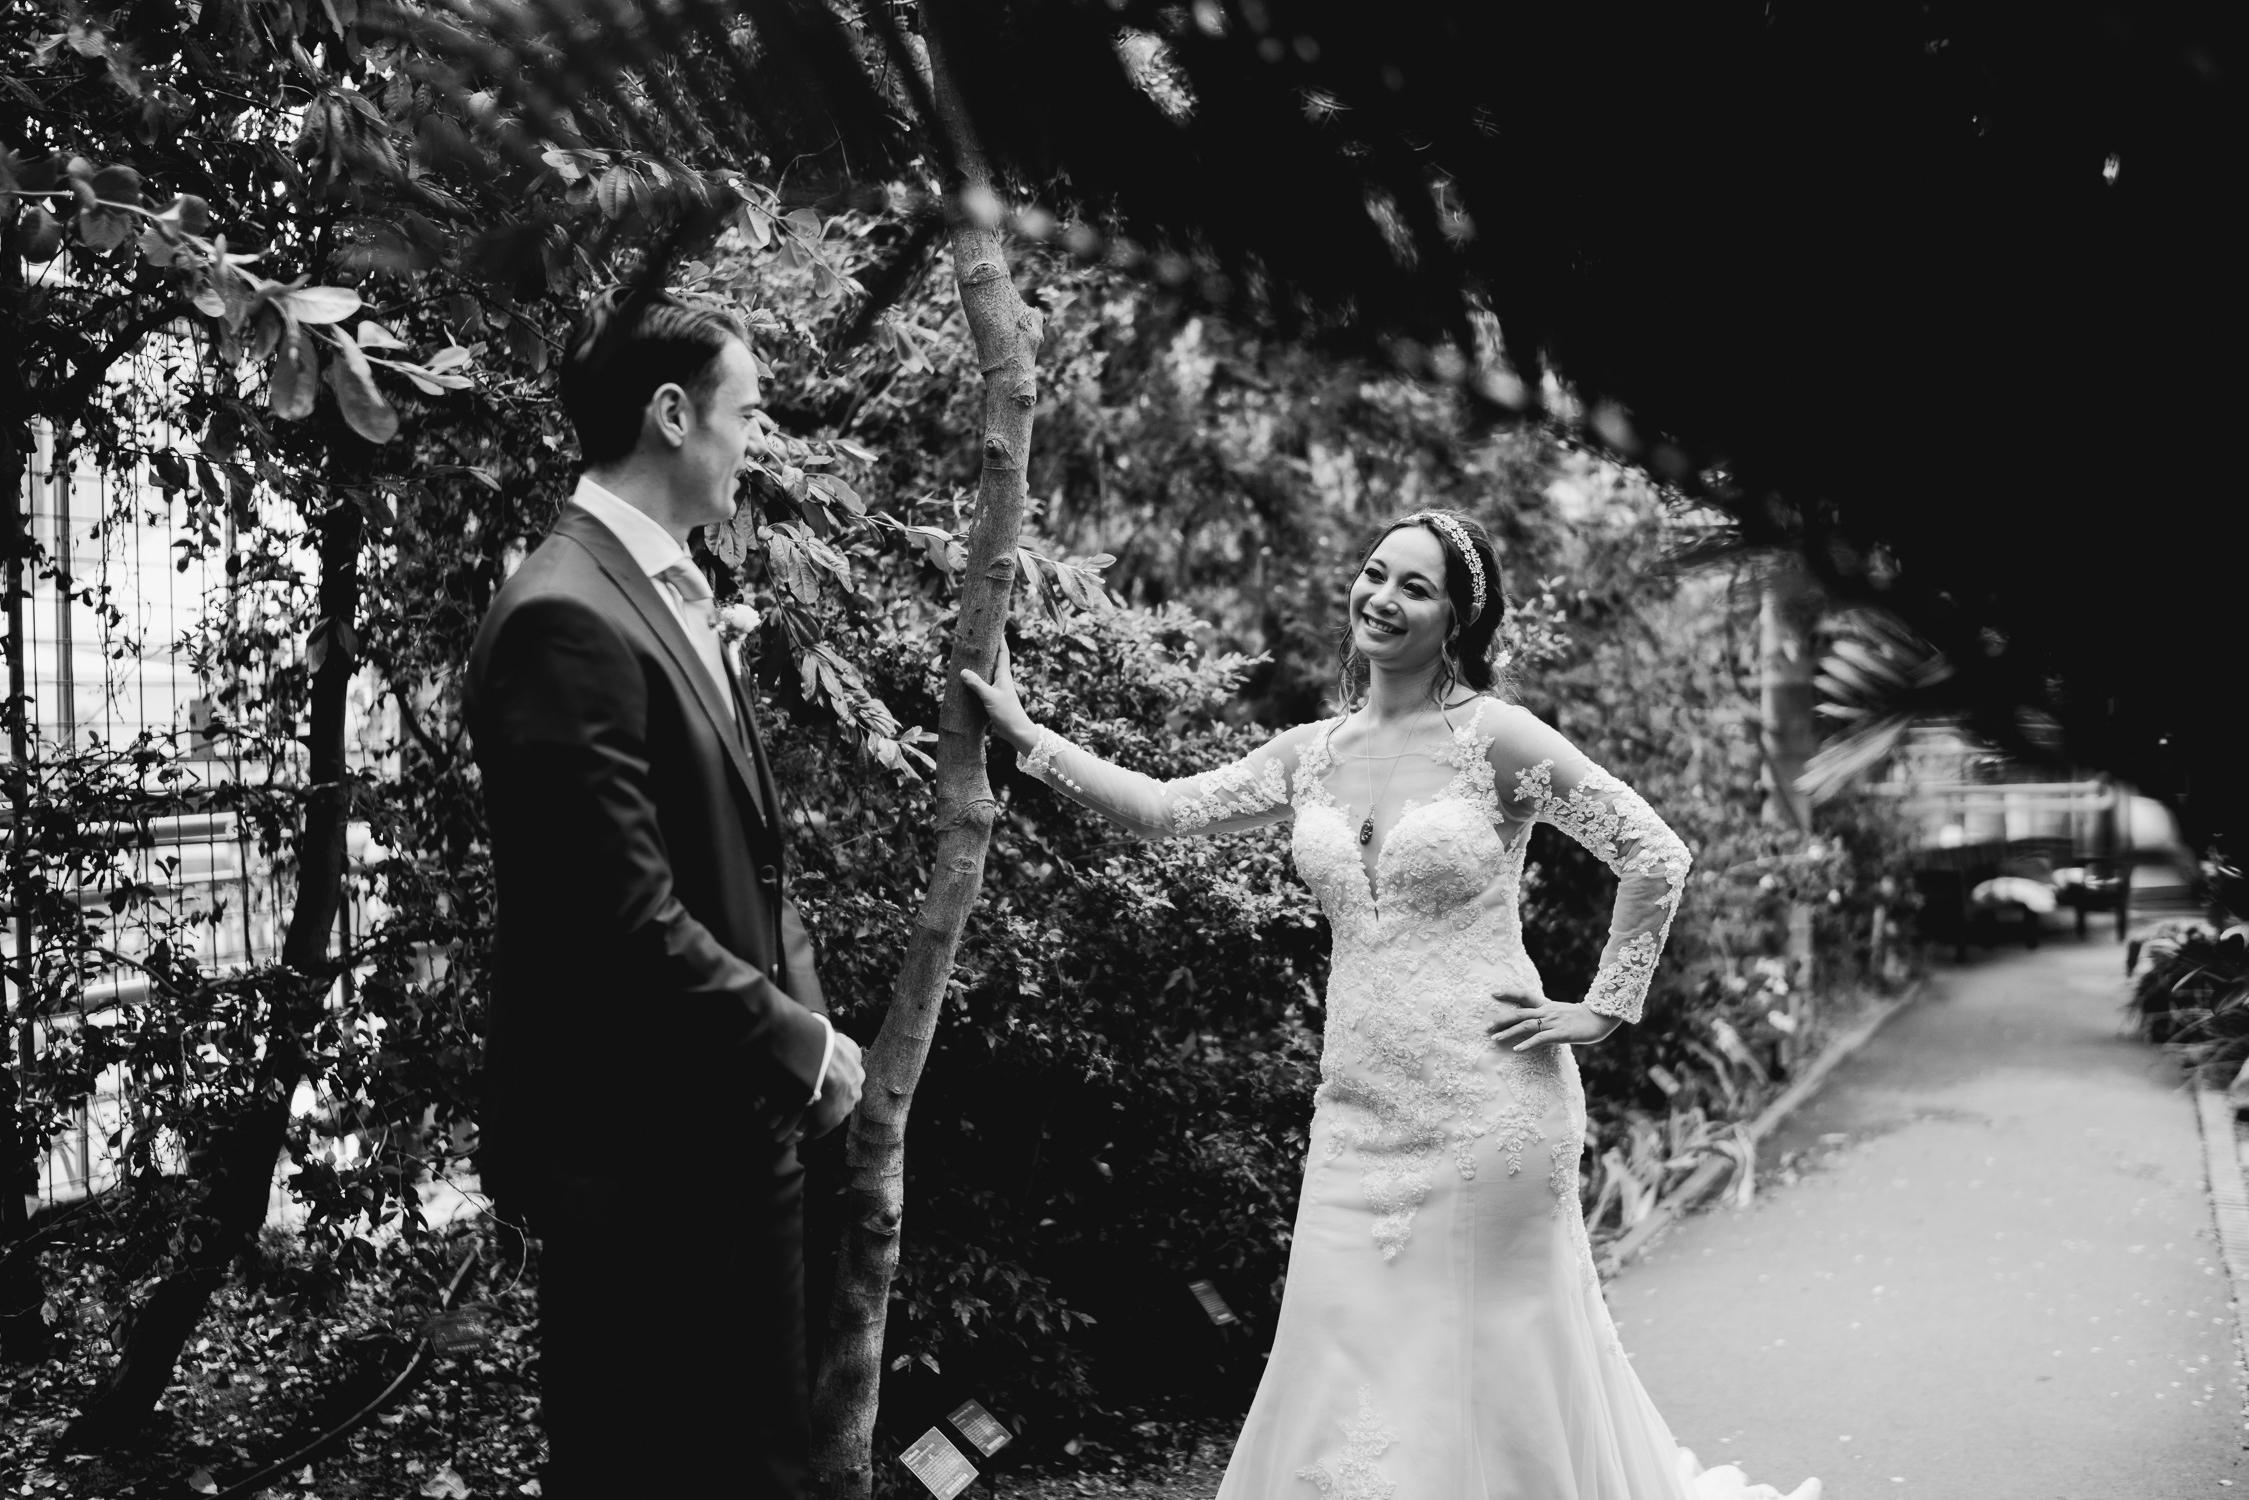 bruidsfotografie-amsterdam-utrecht-trouwfotograaf-mark-hadden-wedding-photography-Robin & Guus-023-2.jpg